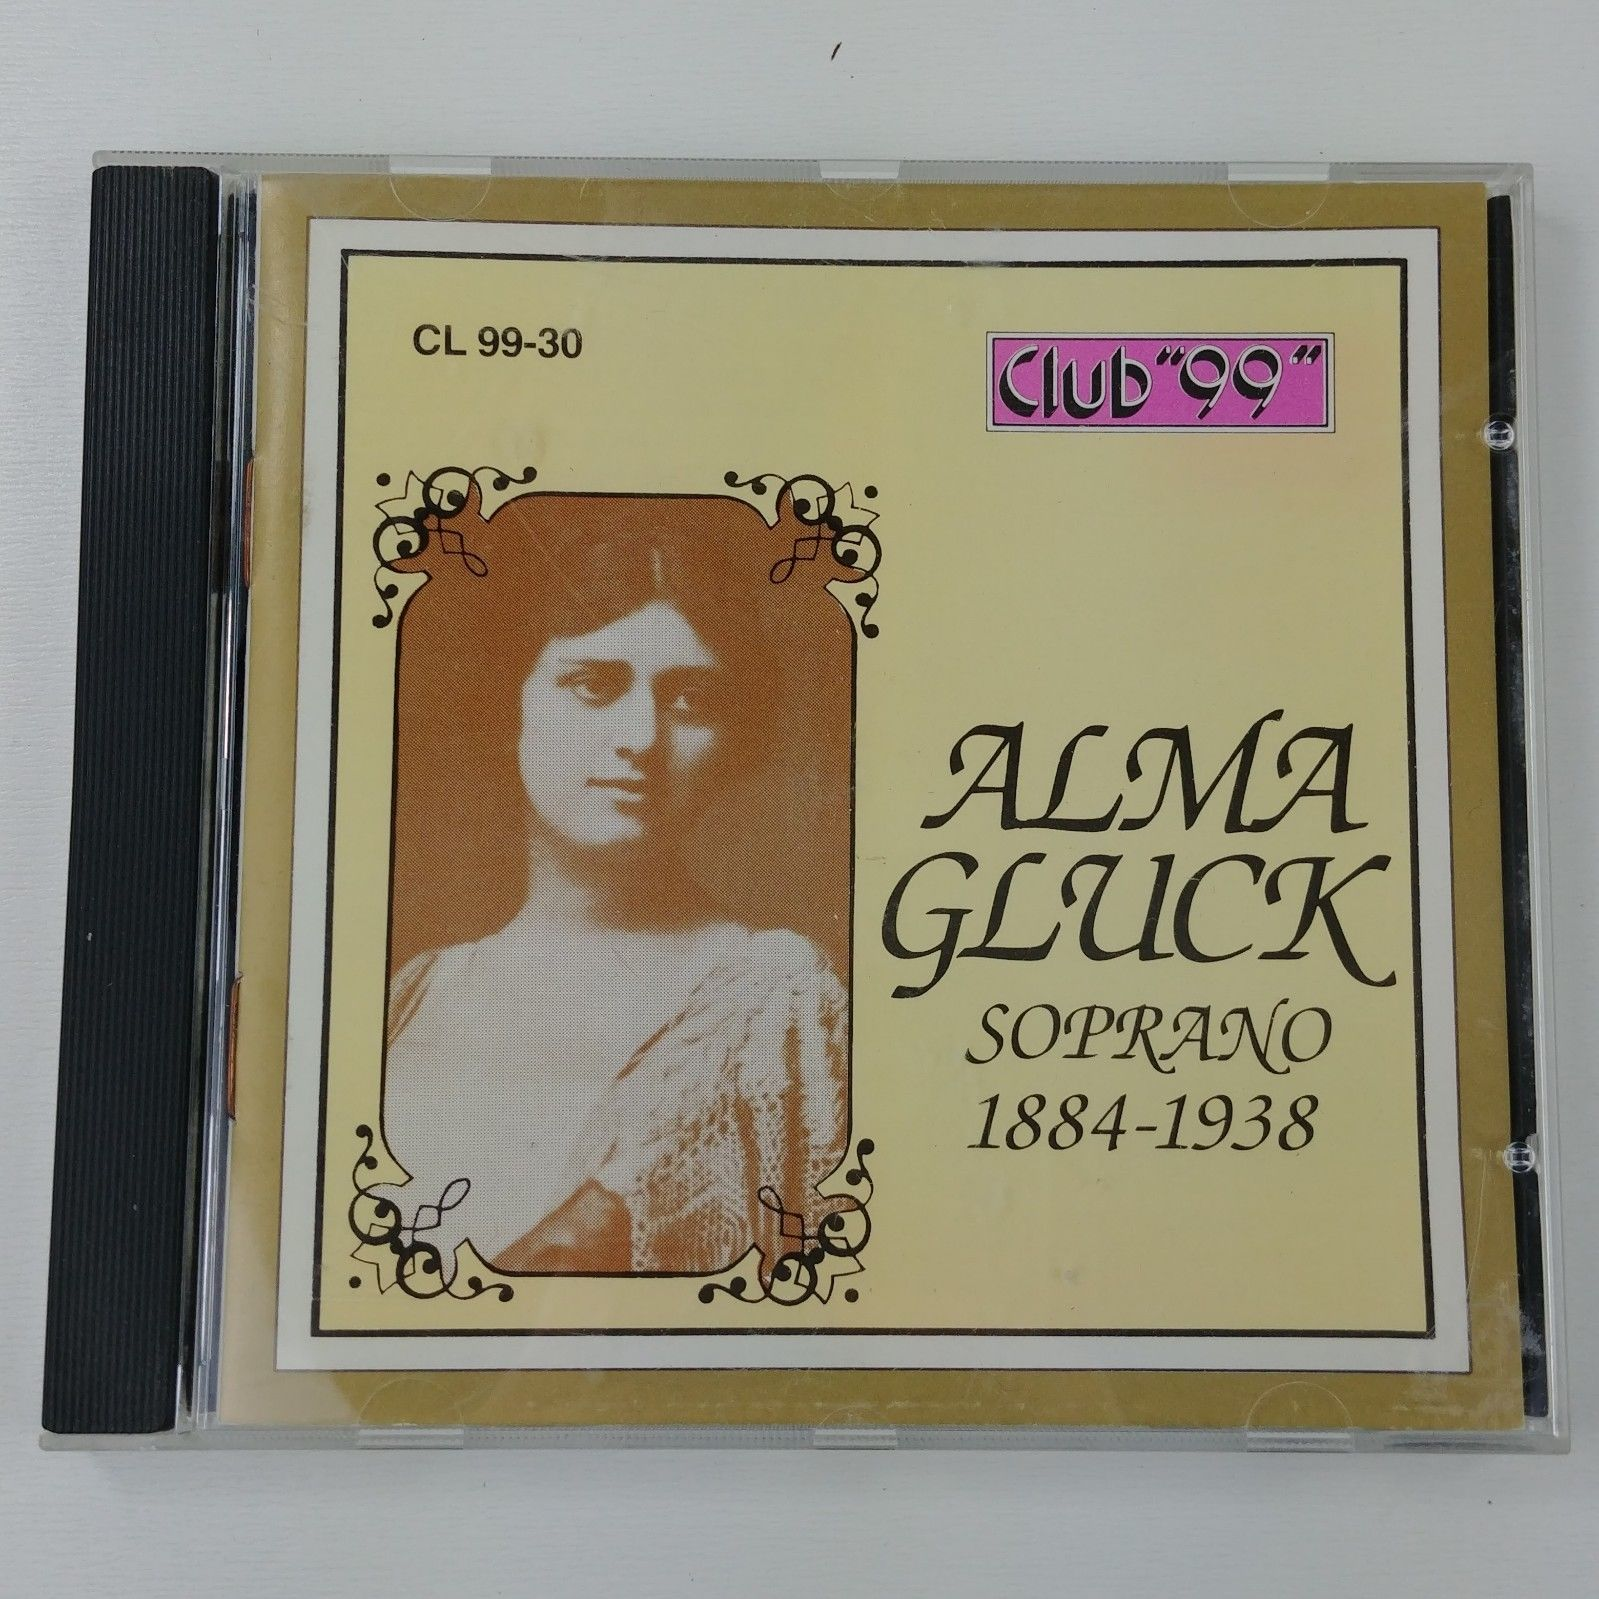 Wc Alma Gluck Soprano 1884 1938 Club 99 17 Of The Best Songs Opera Audio CD